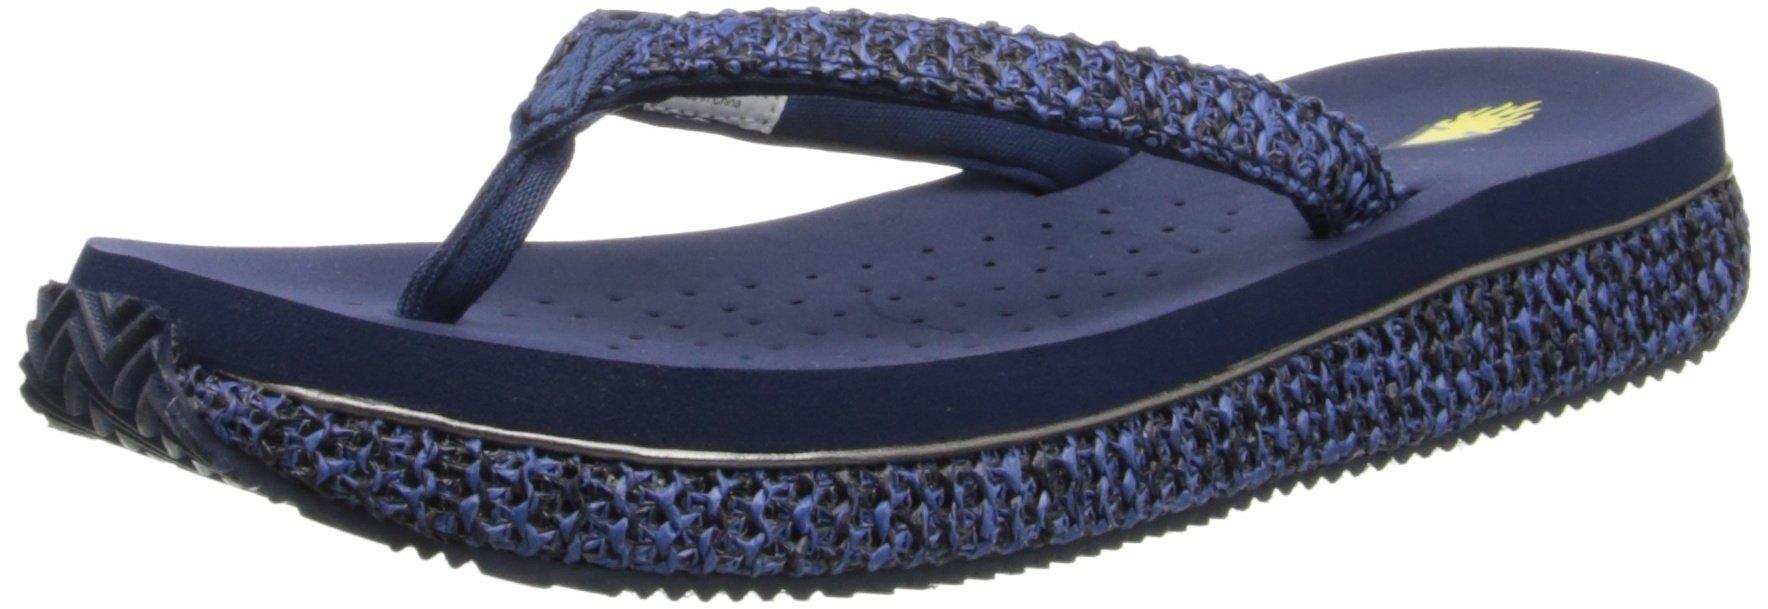 Volatile Women's Palau Wedge Sandal,Navy,7 B US